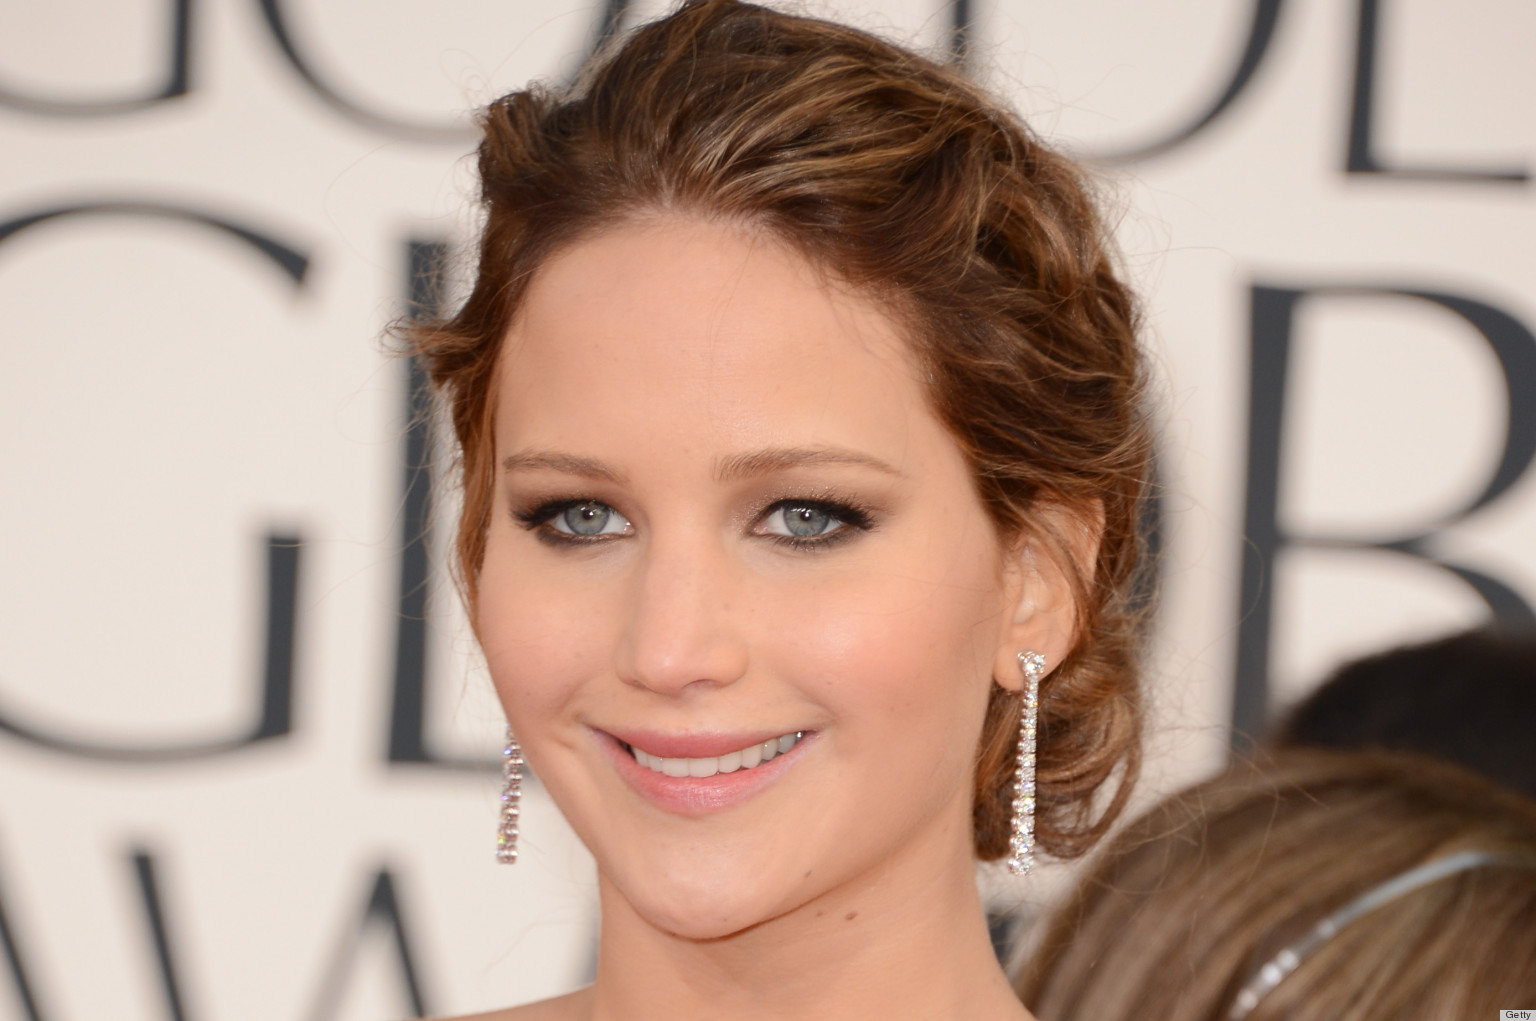 Jennifer Lawrences Golden Globes Dress 2013 Is A Winner